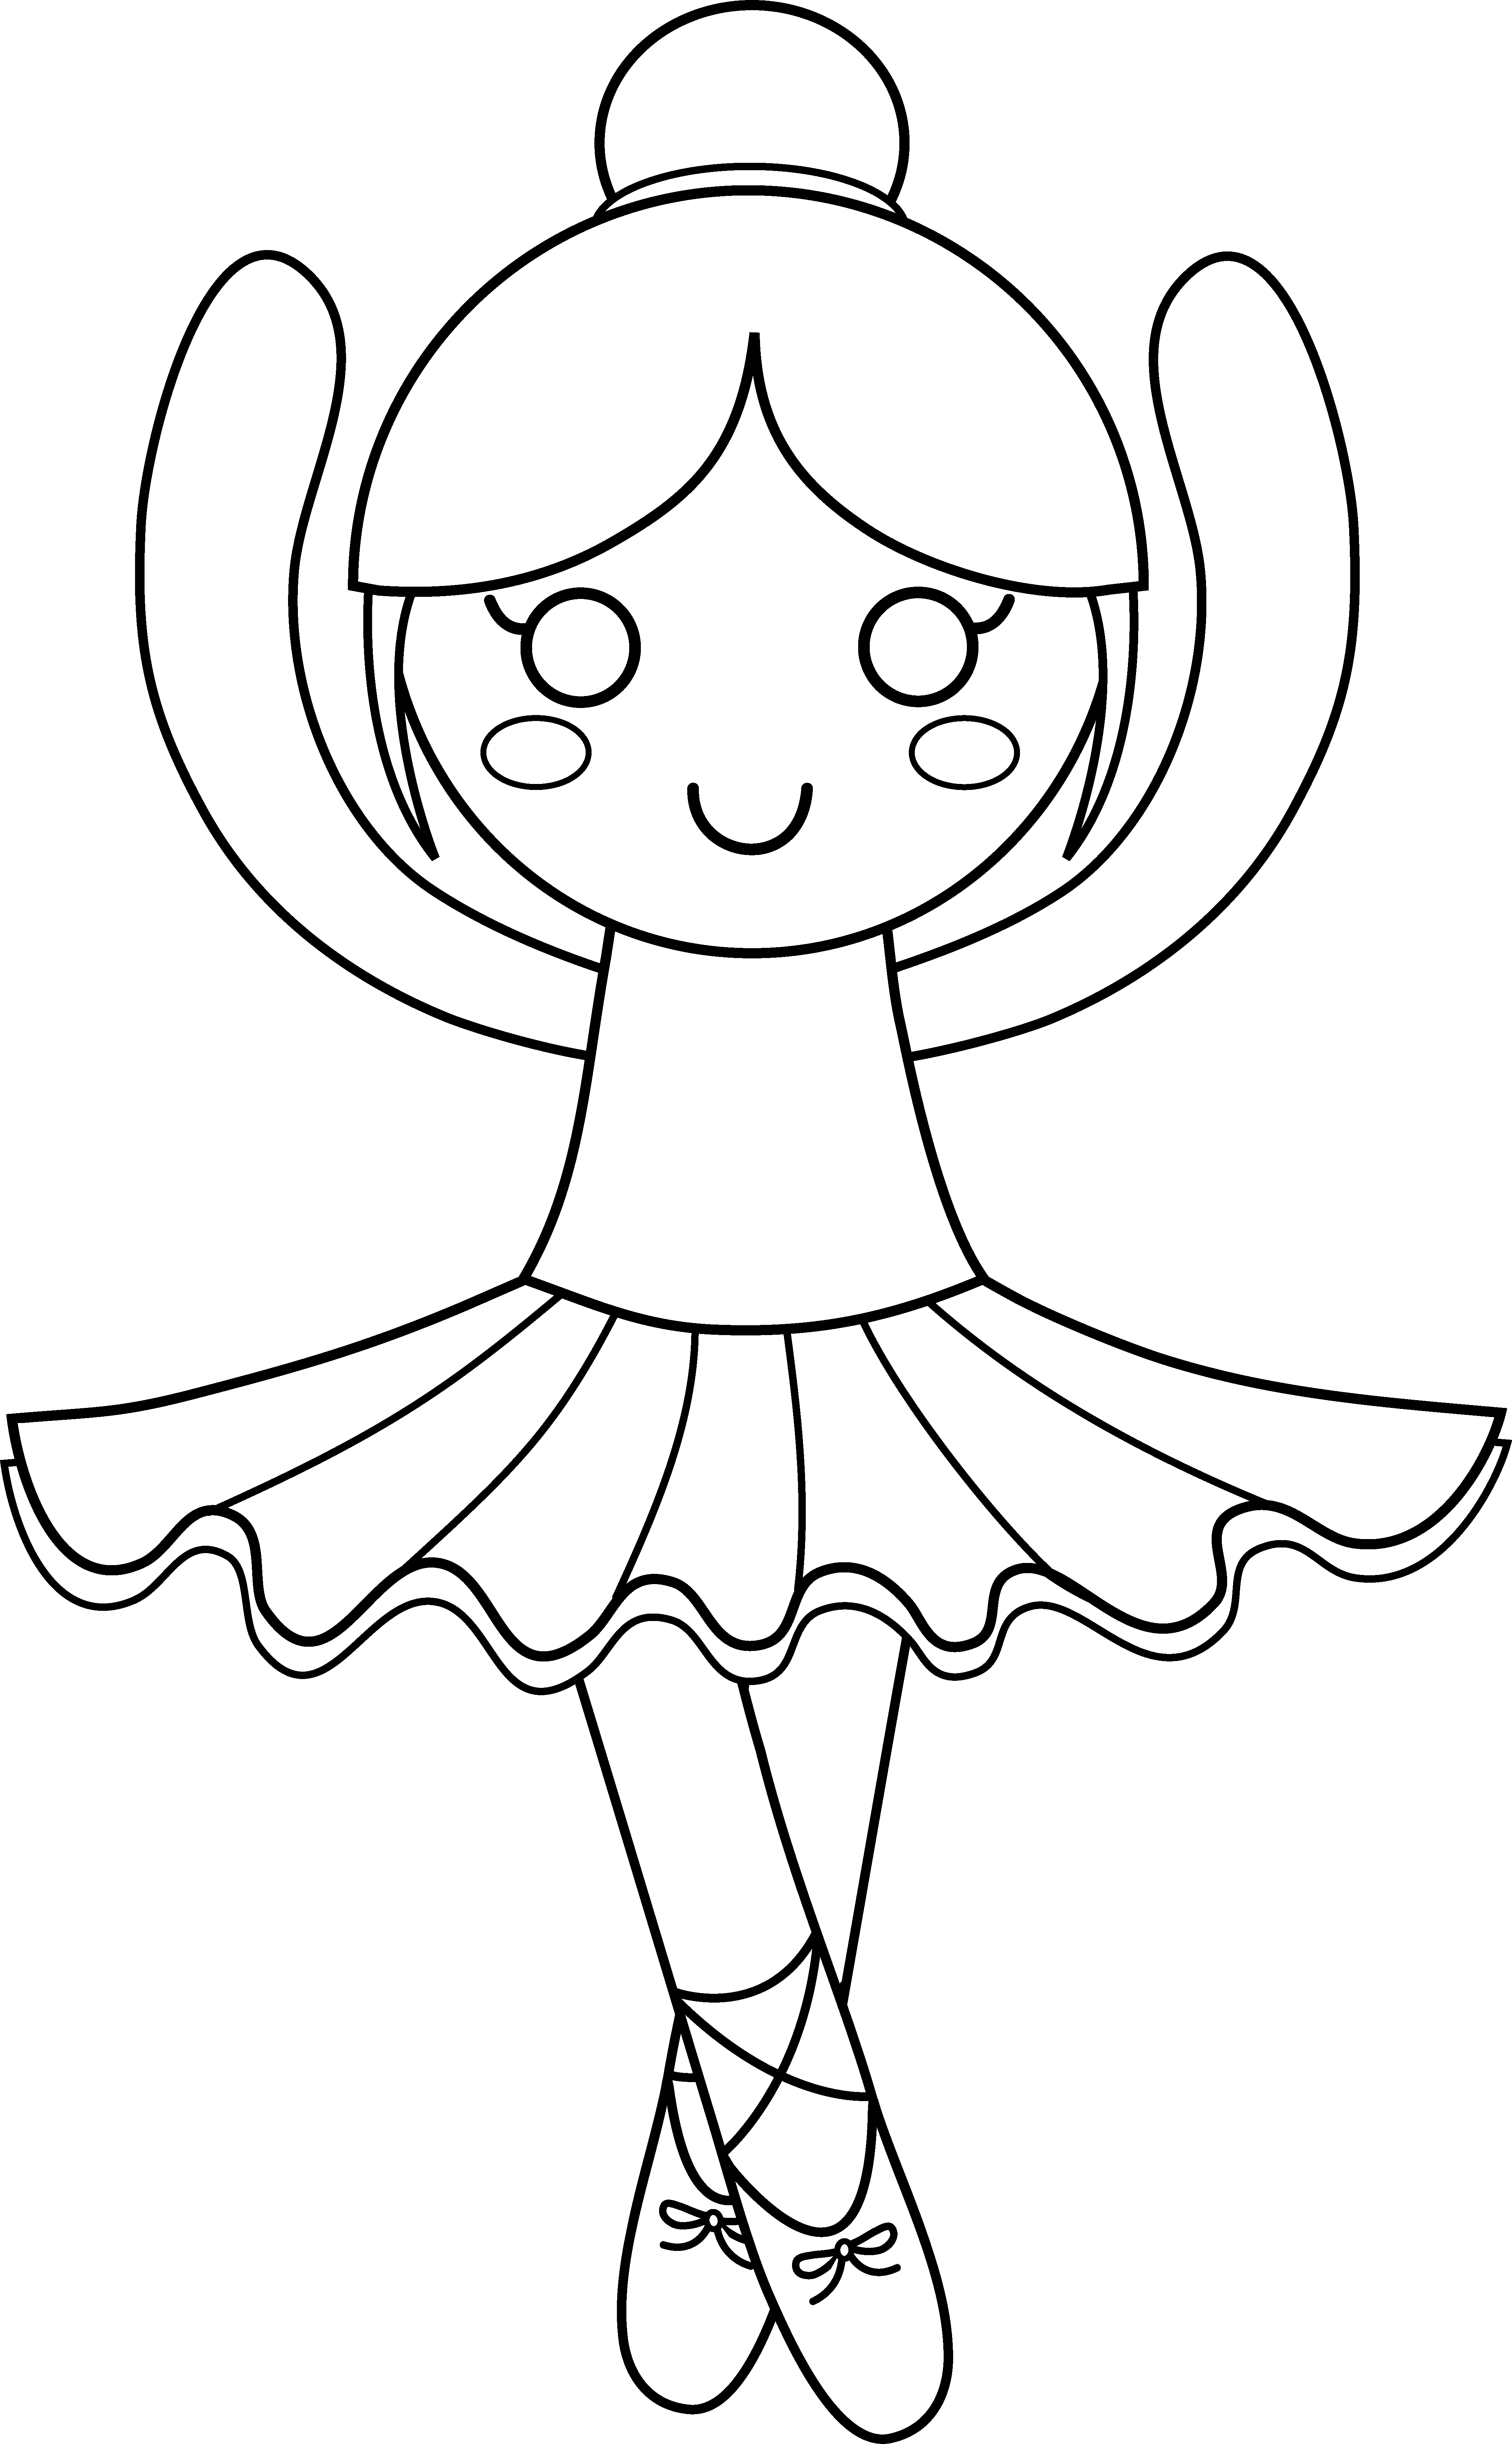 Turkey ballerina clipart vector free library Cute Ballerina Coloring Page - Free Clip Art vector free library